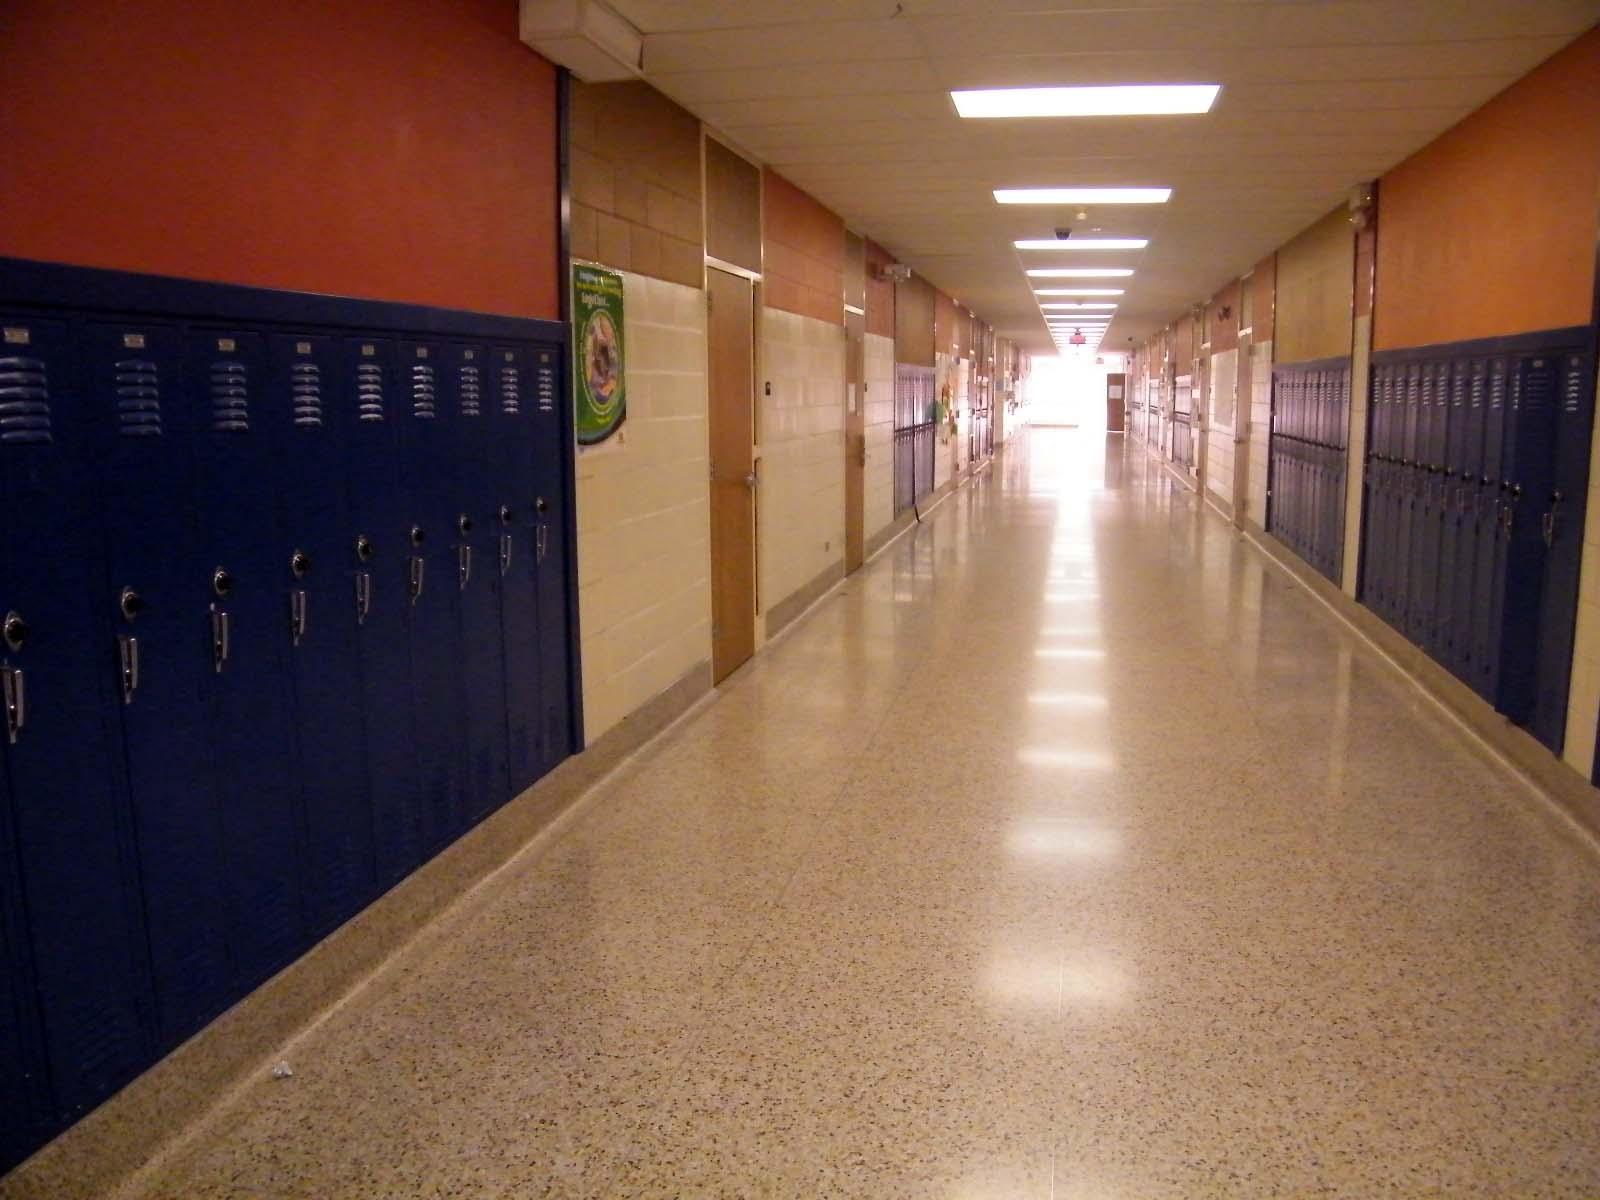 school hallway clip art - photo #13